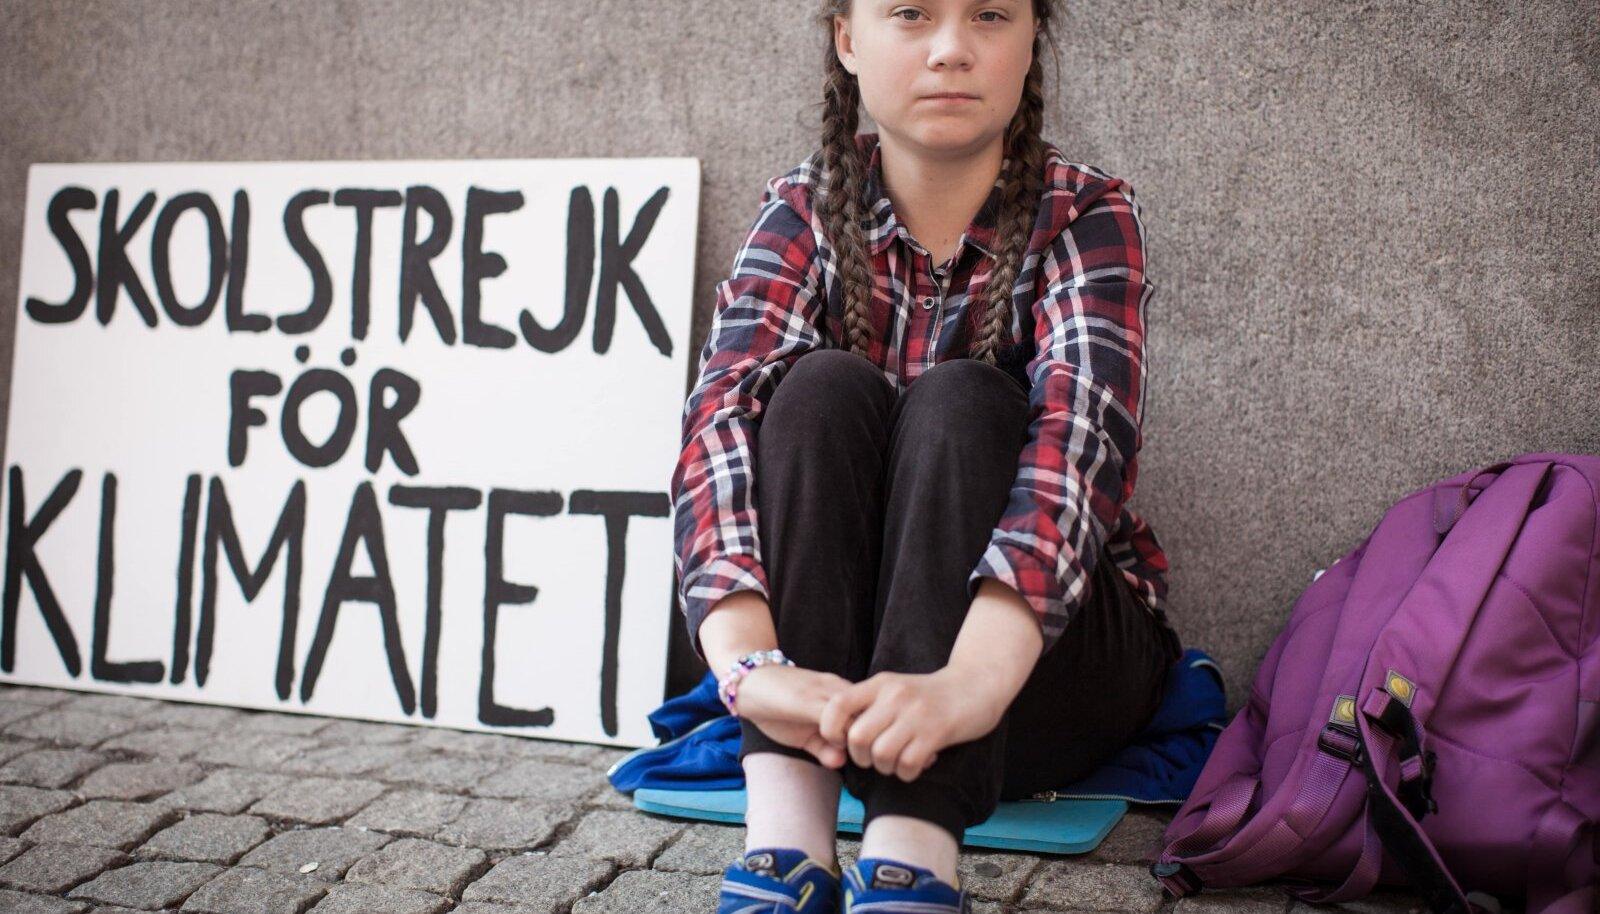 """Greta Thunbergi lugu"""